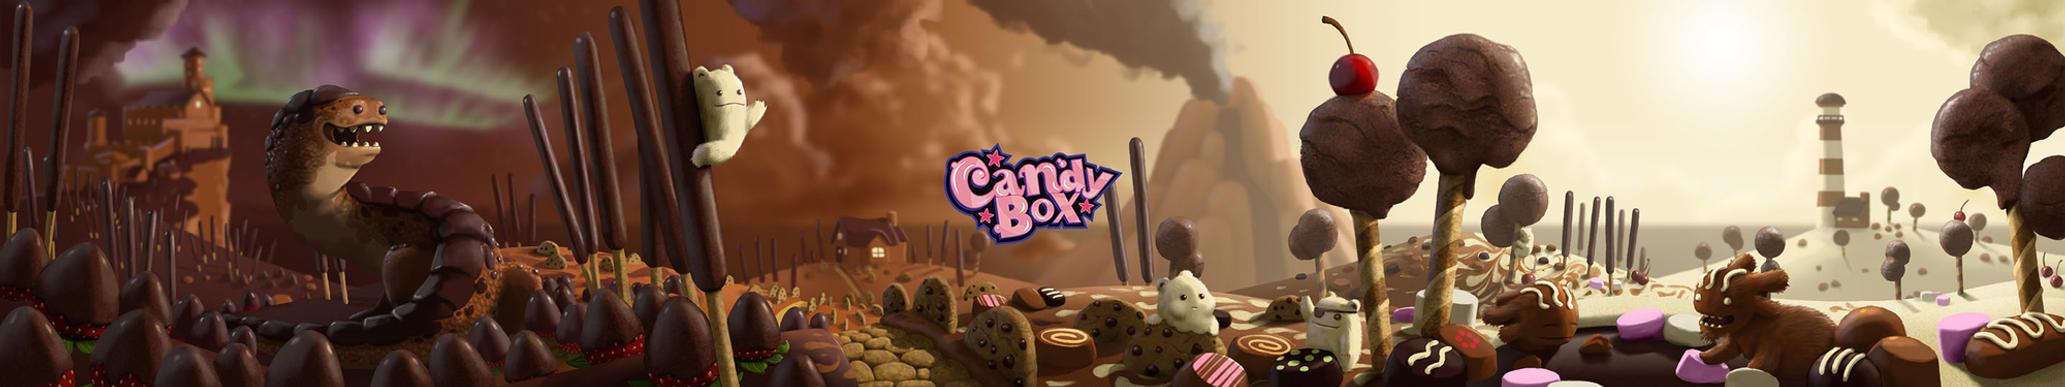 Candy Box - Website Background by AndrewMcIntoshArt